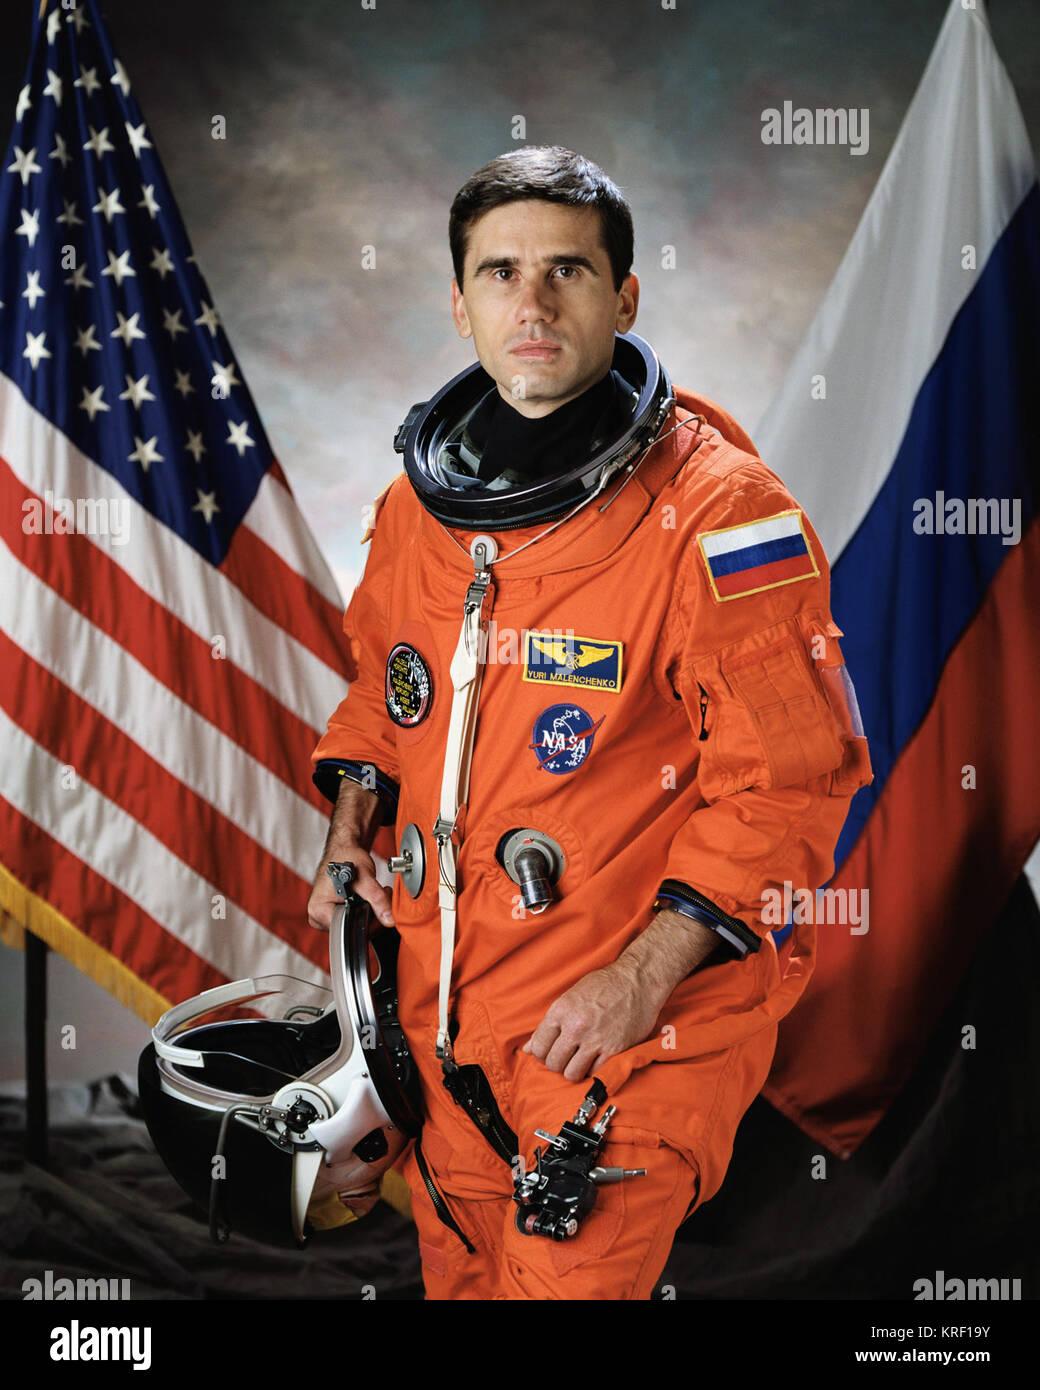 Malenchenko - Stock Image